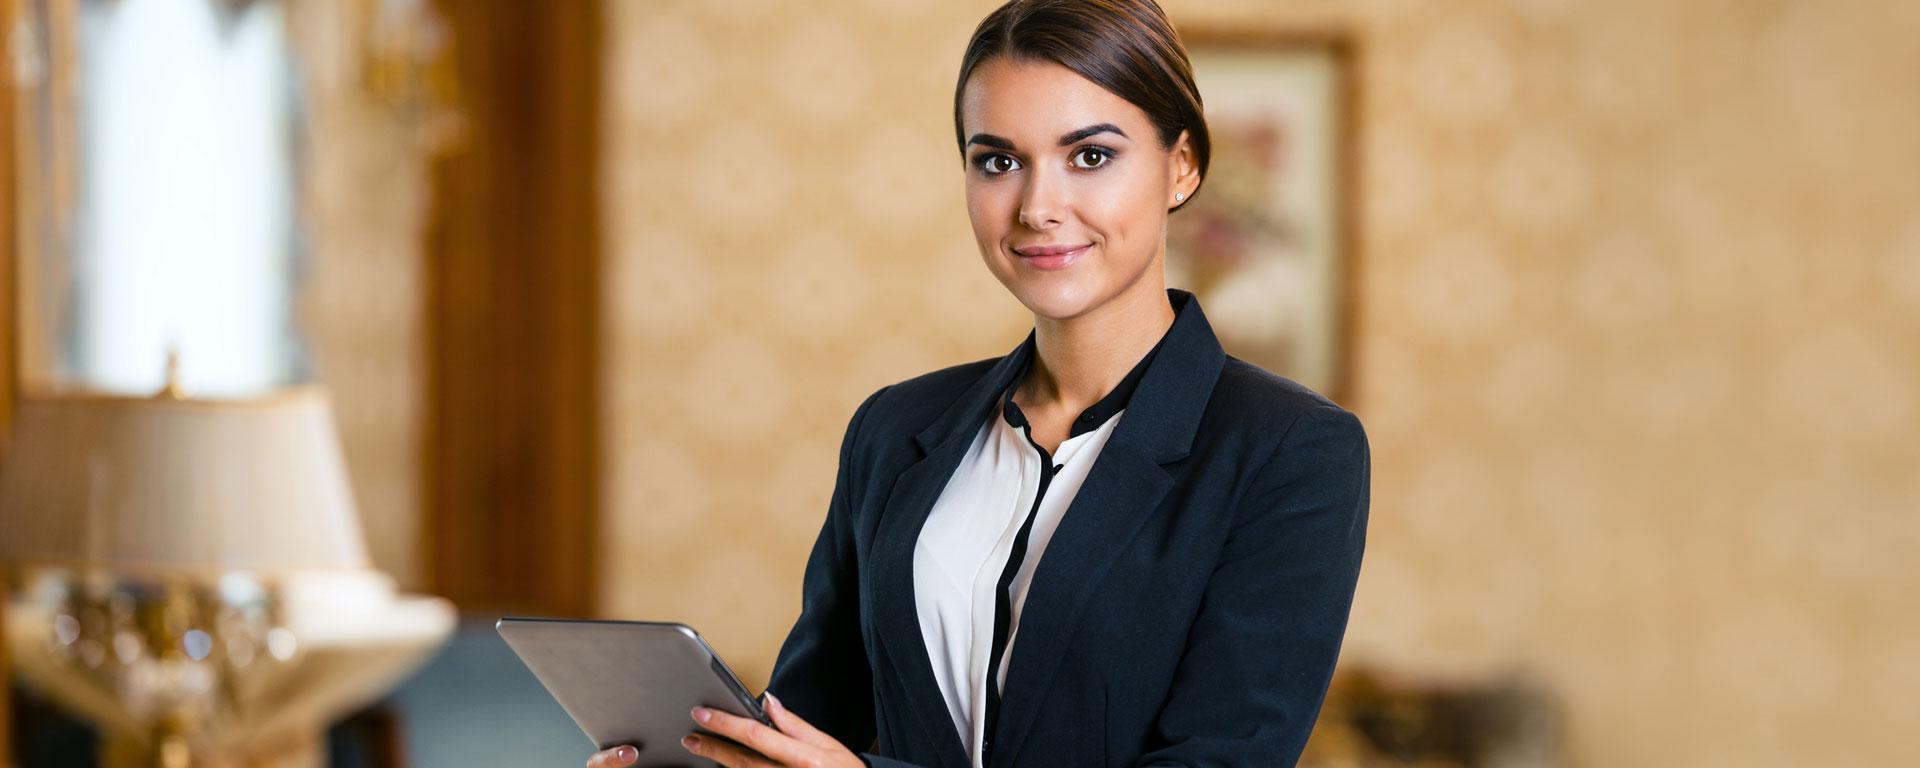 Linchris Hotel Corporation Open Positions